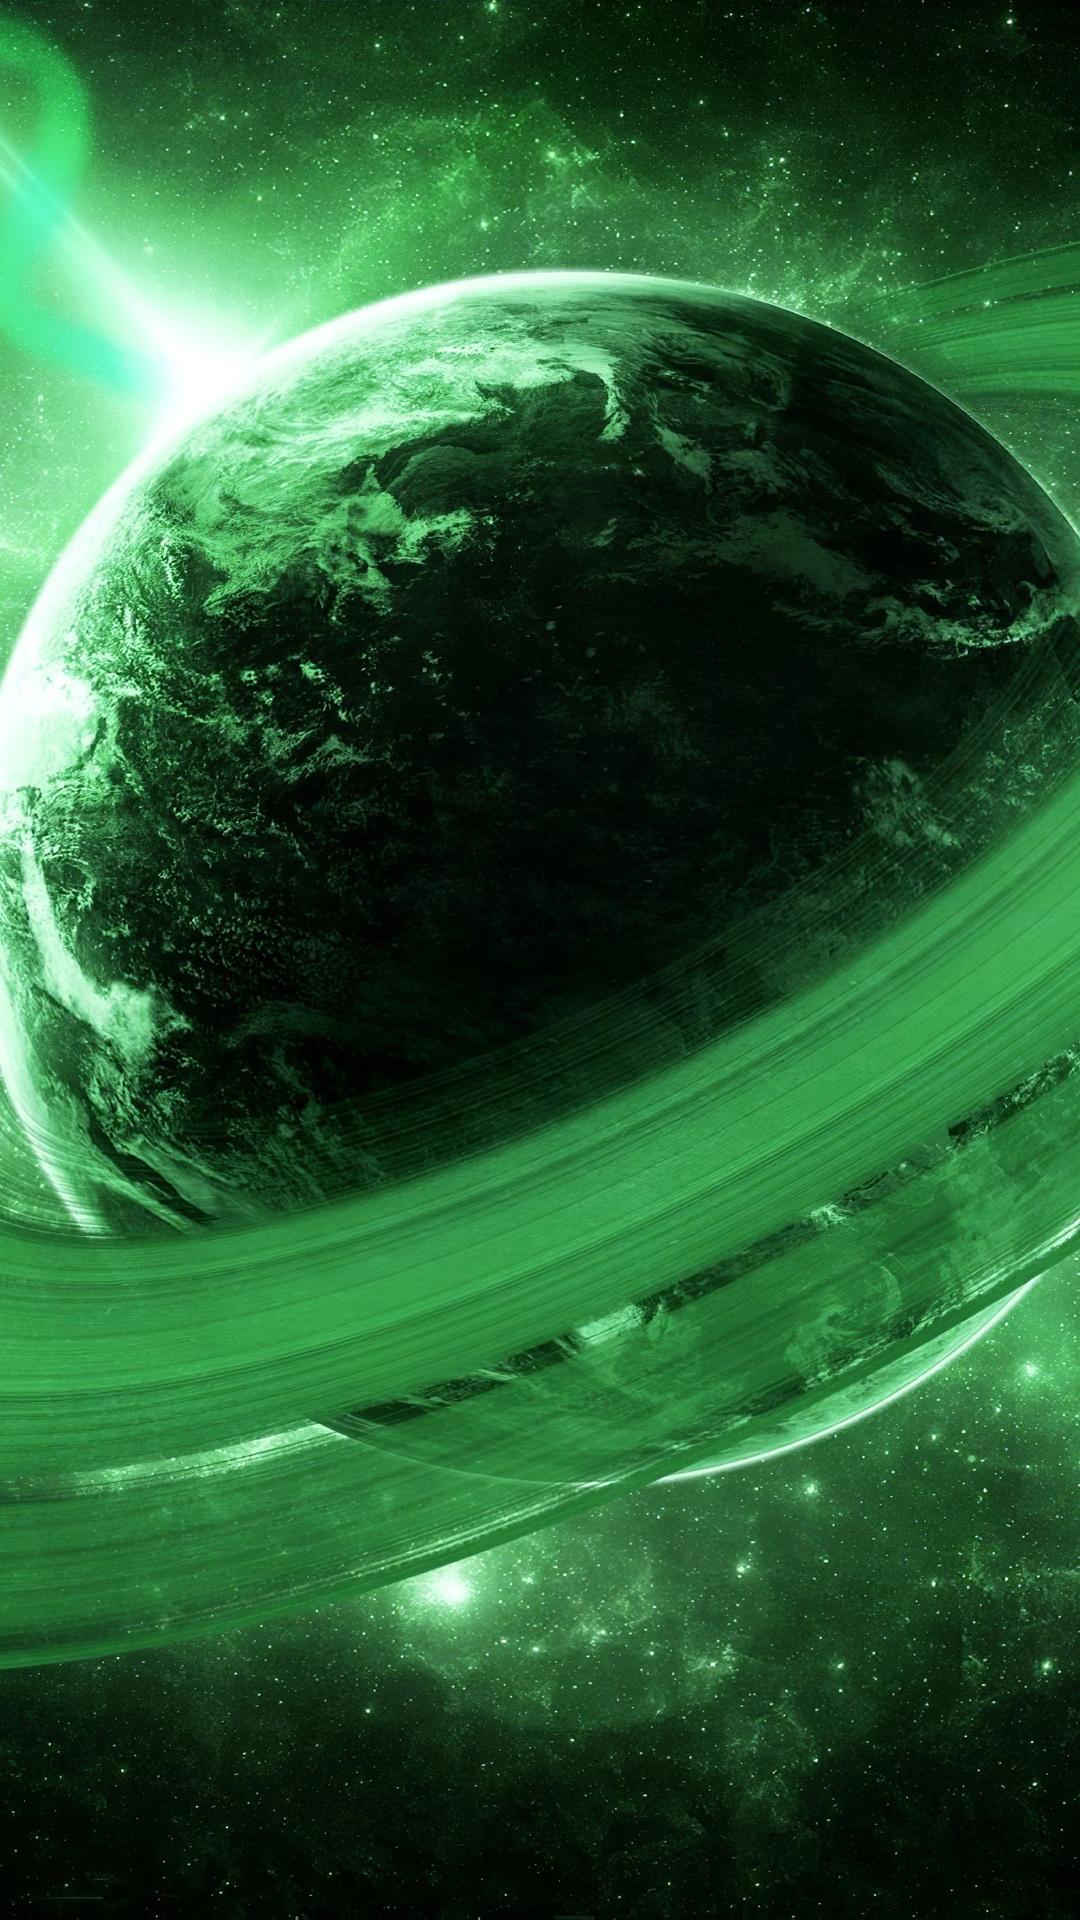 galaxy-rings-planet-4k-ky.jpg